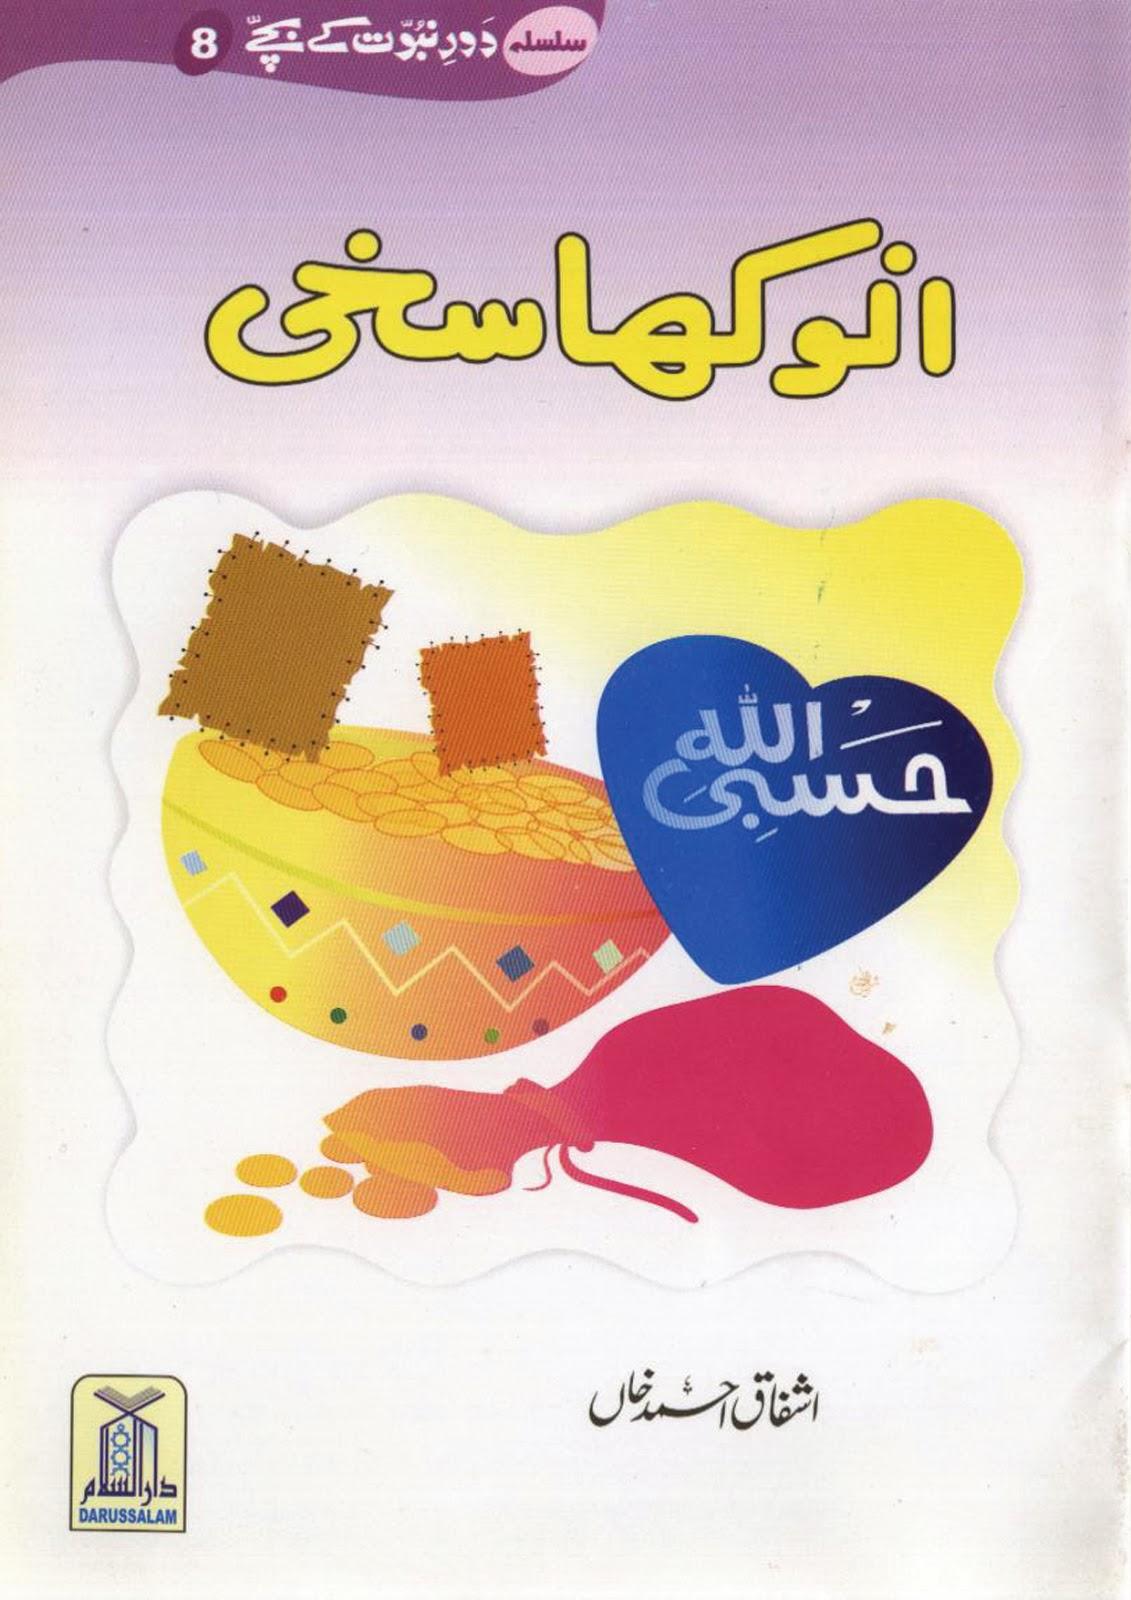 http://urduguru1.blogspot.com/2014/02/anokha-sakhi-saeed-bin-asa-ra.html